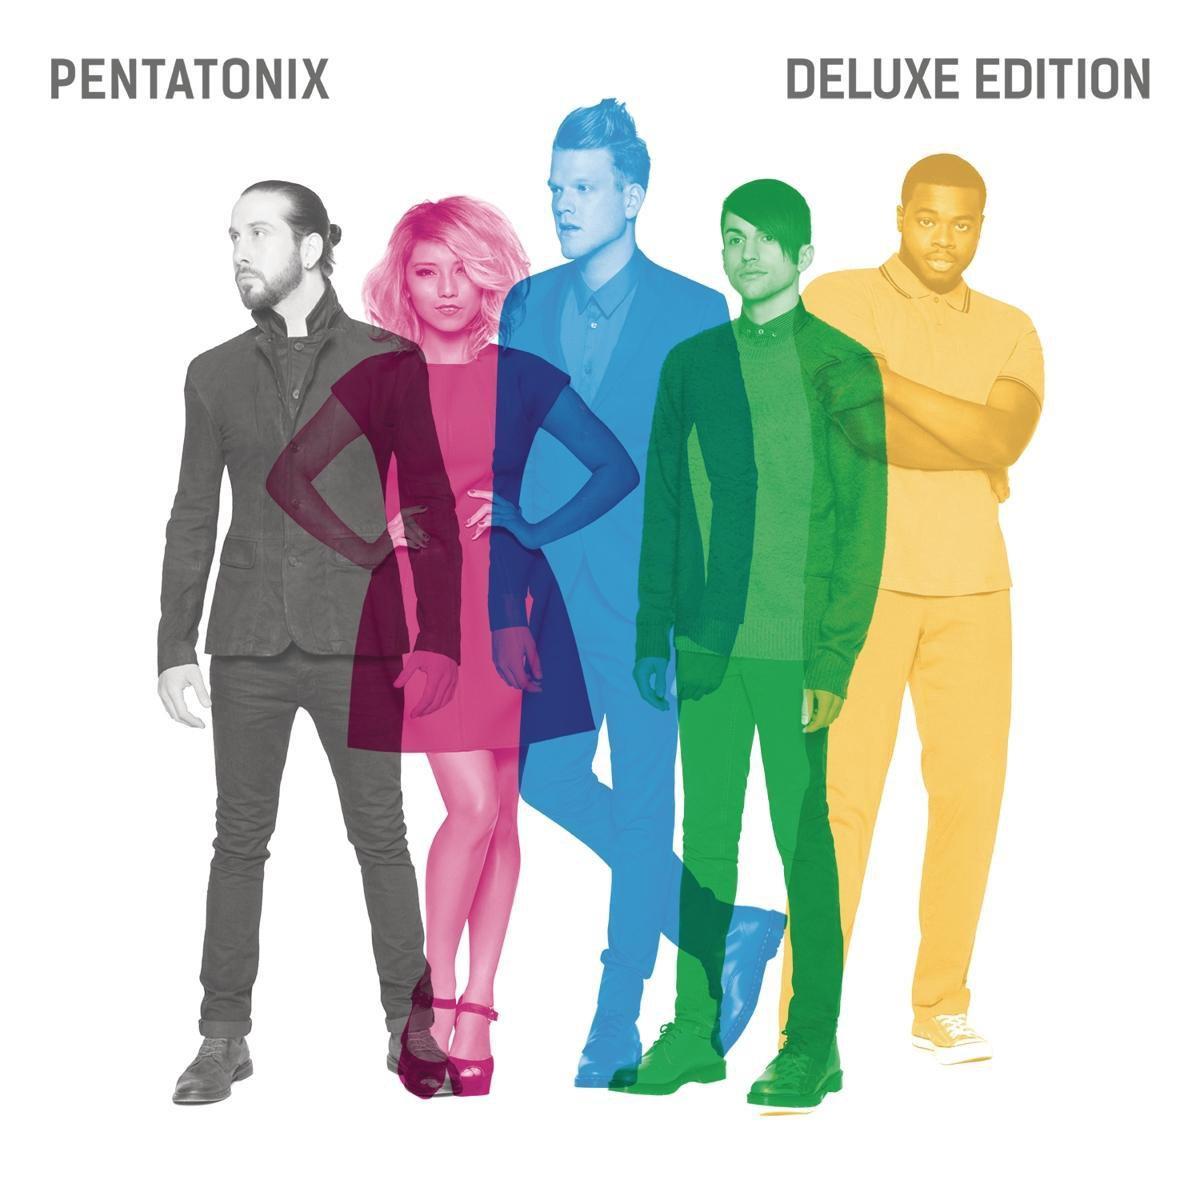 Pentatonix (Deluxe Edition) - Pentatonix